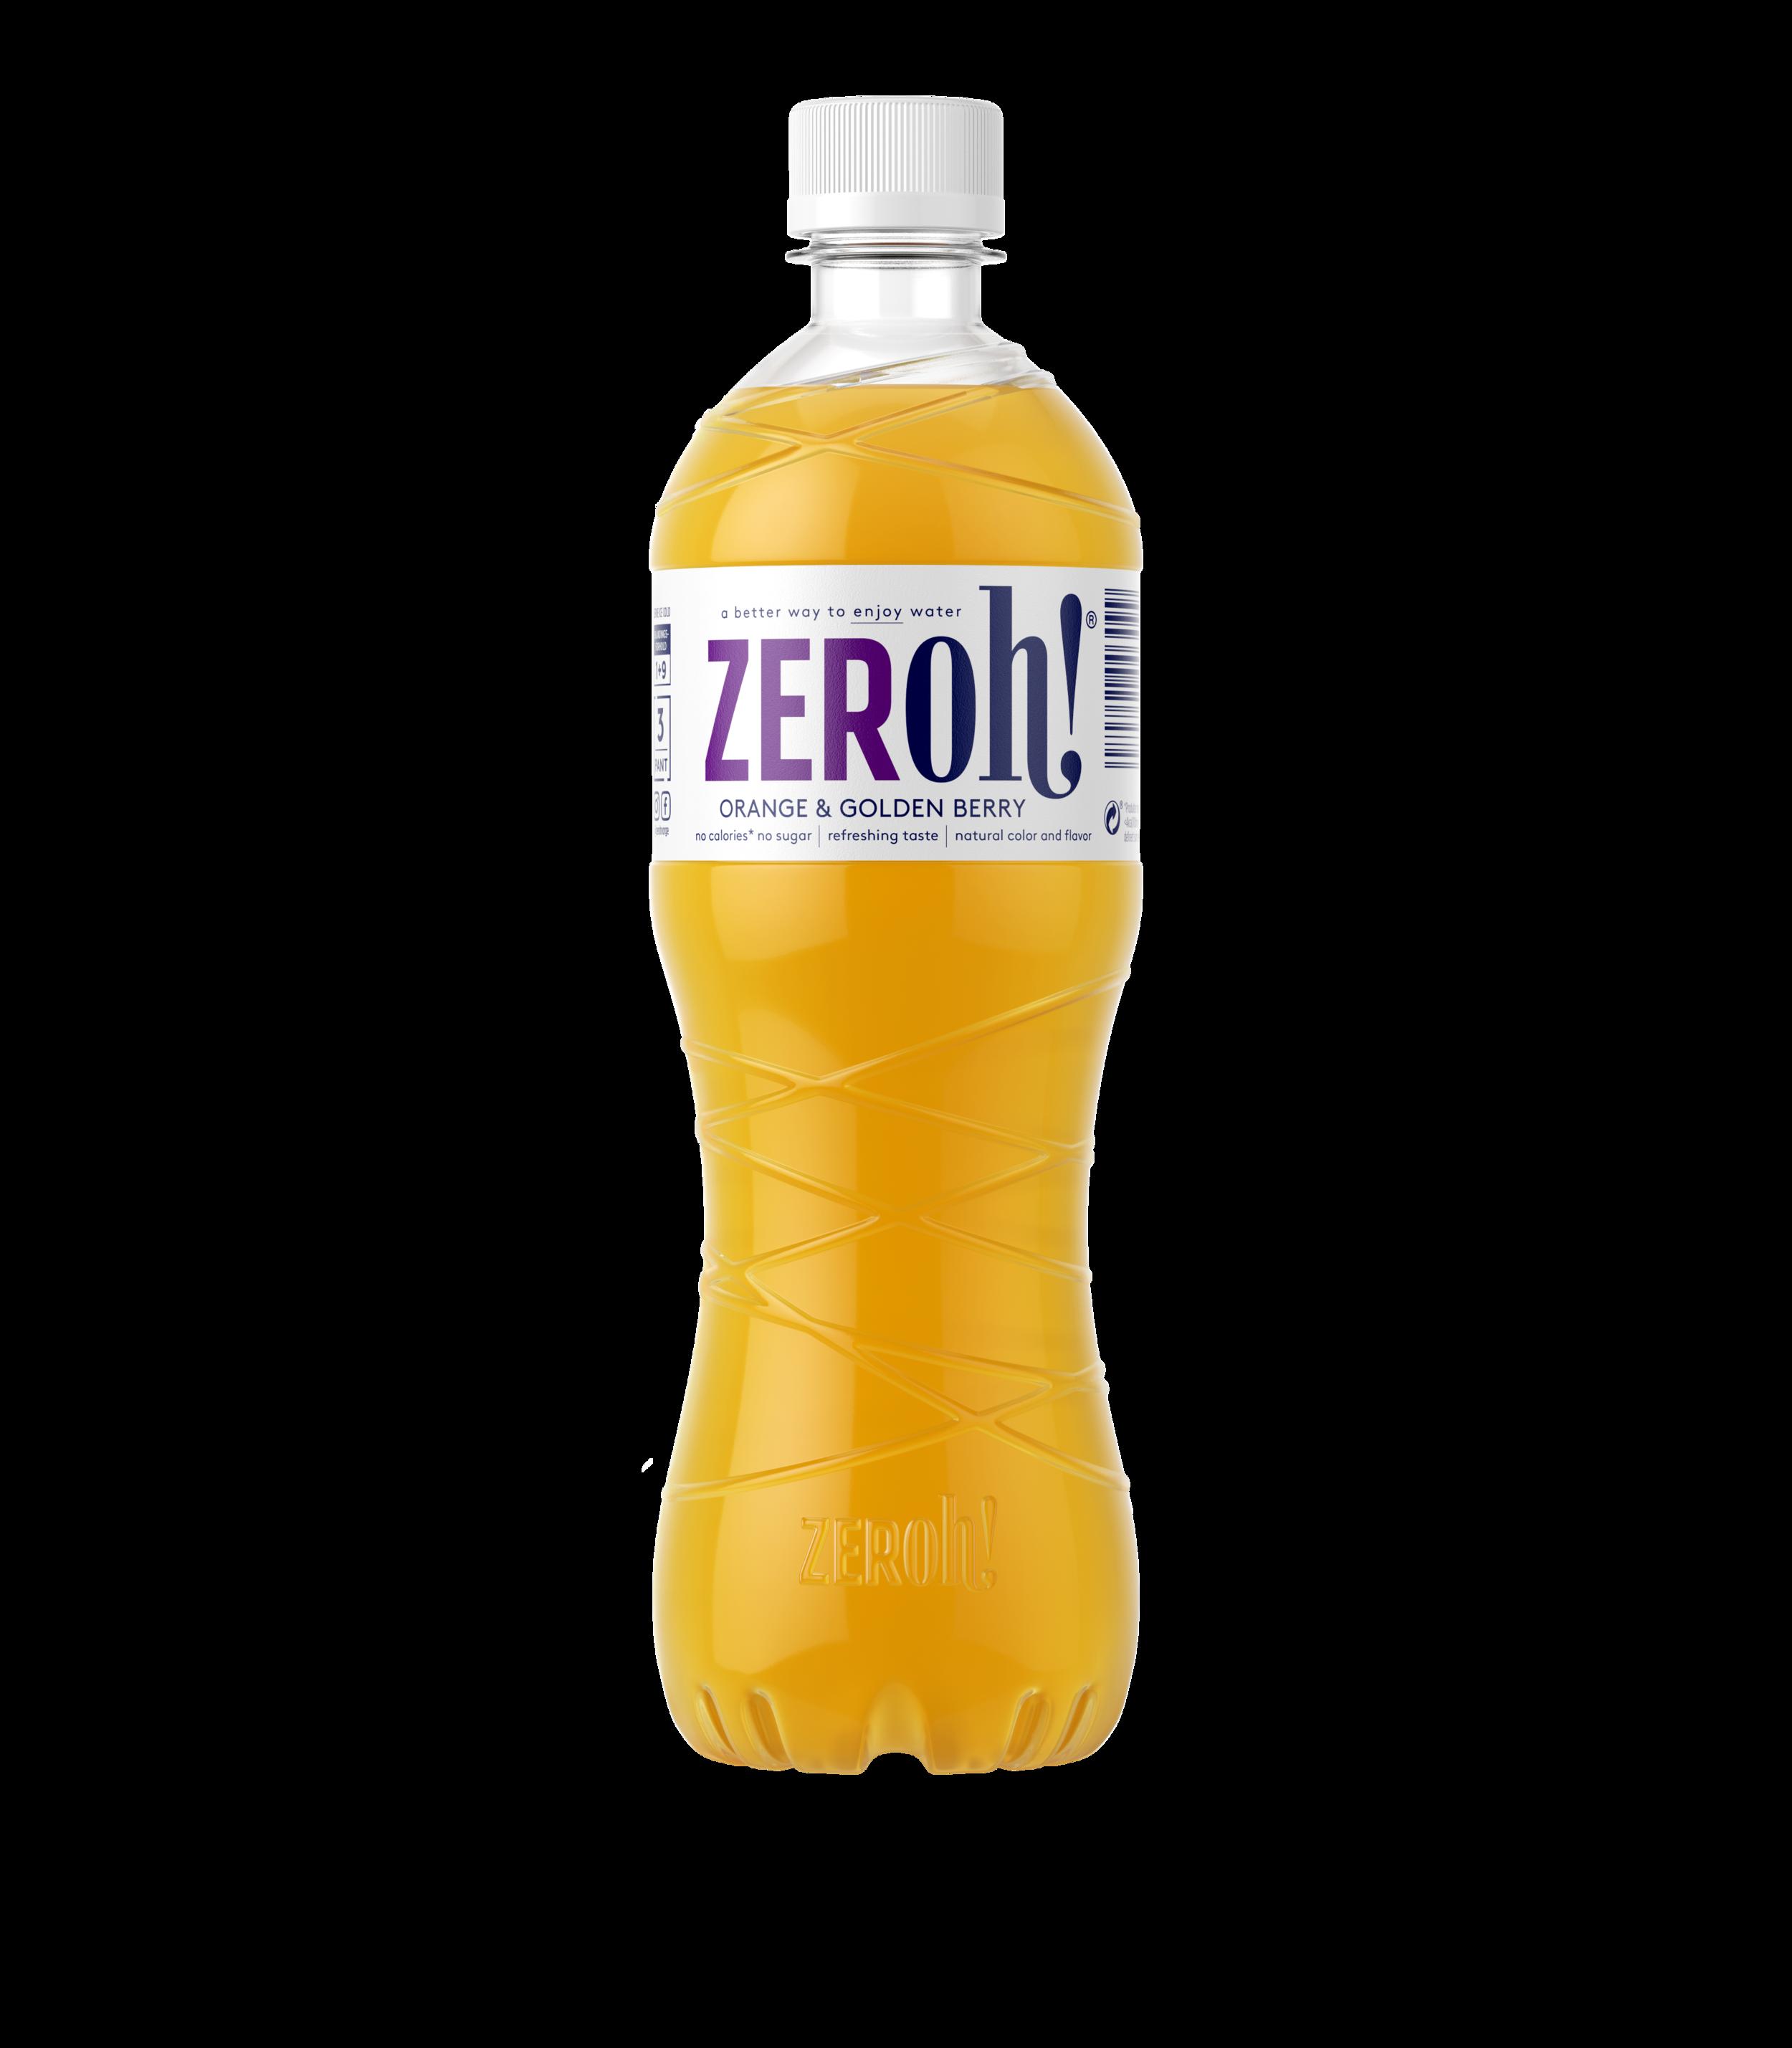 ZERoh! Orange & Golden Berry 2019 3D transparent.png